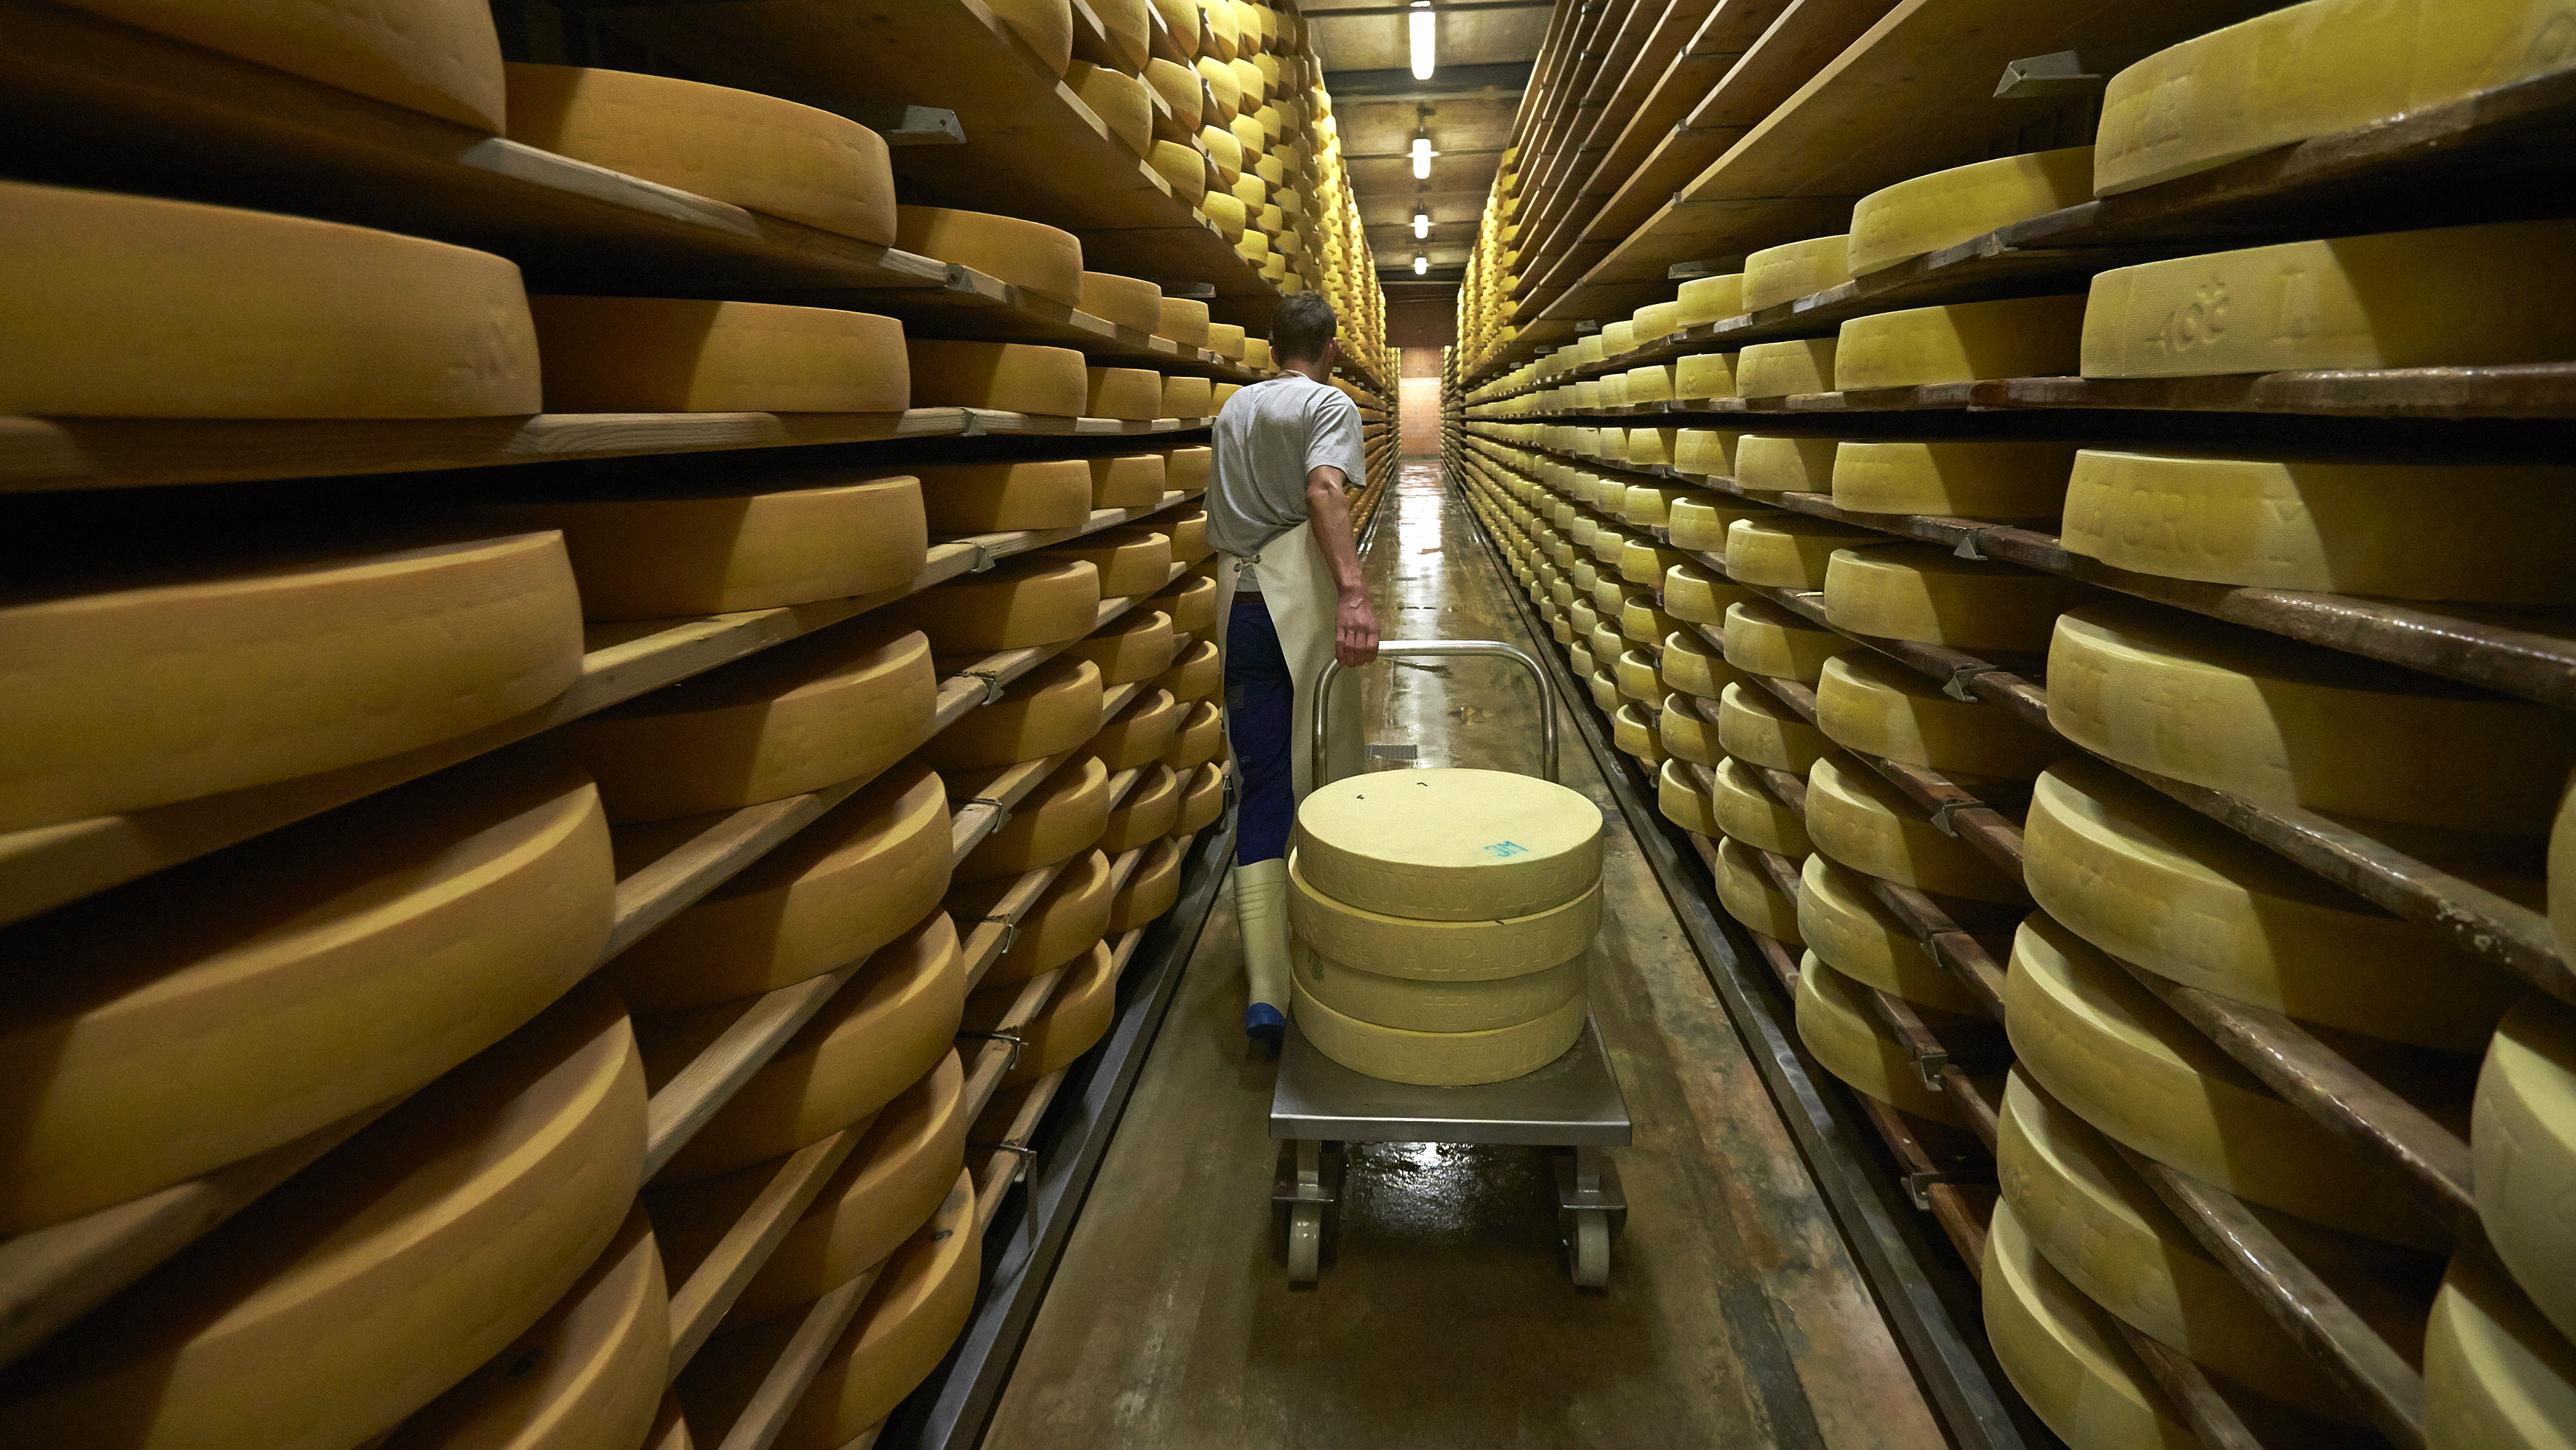 c-cheese-RTX14EHE-Denis Balibouse